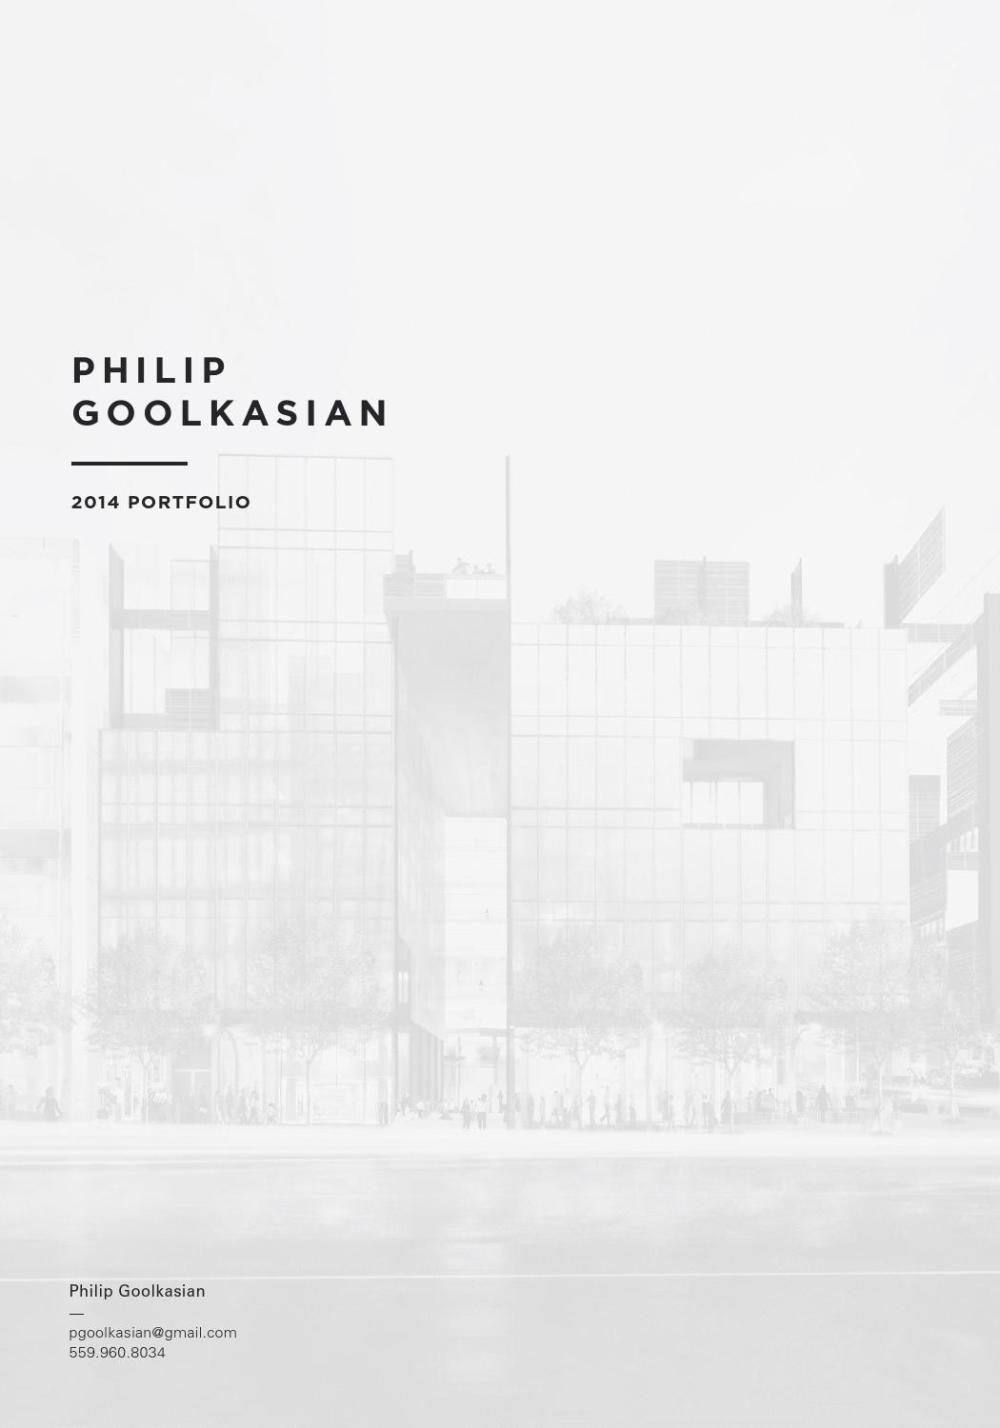 medium resolution of philip goolkasian 2014 architecture portfolio by philip goolkasian issuu